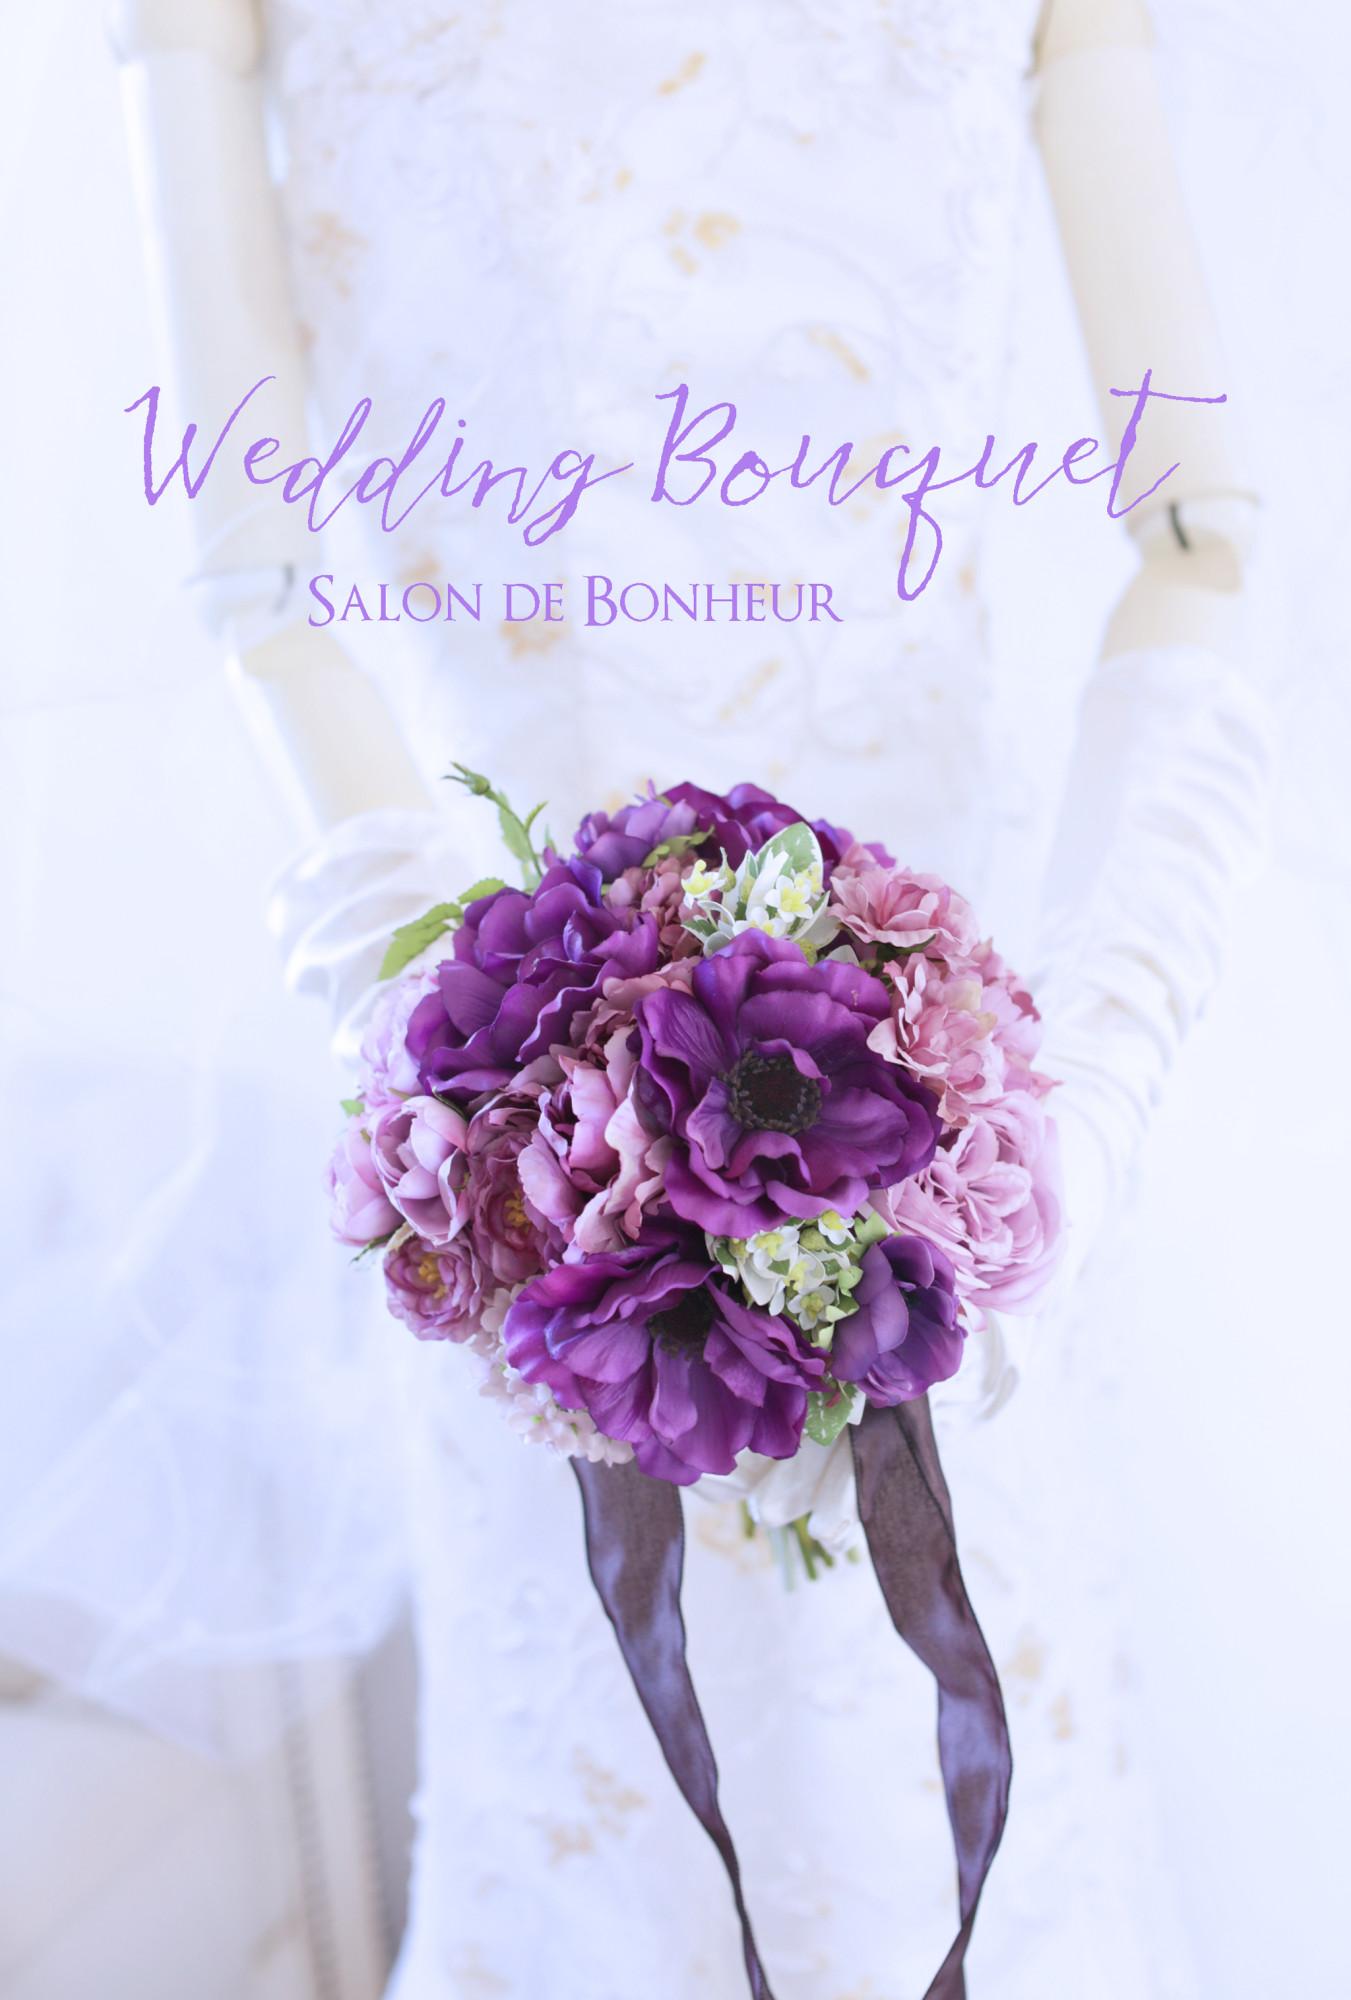 b_bouquet20180211_1